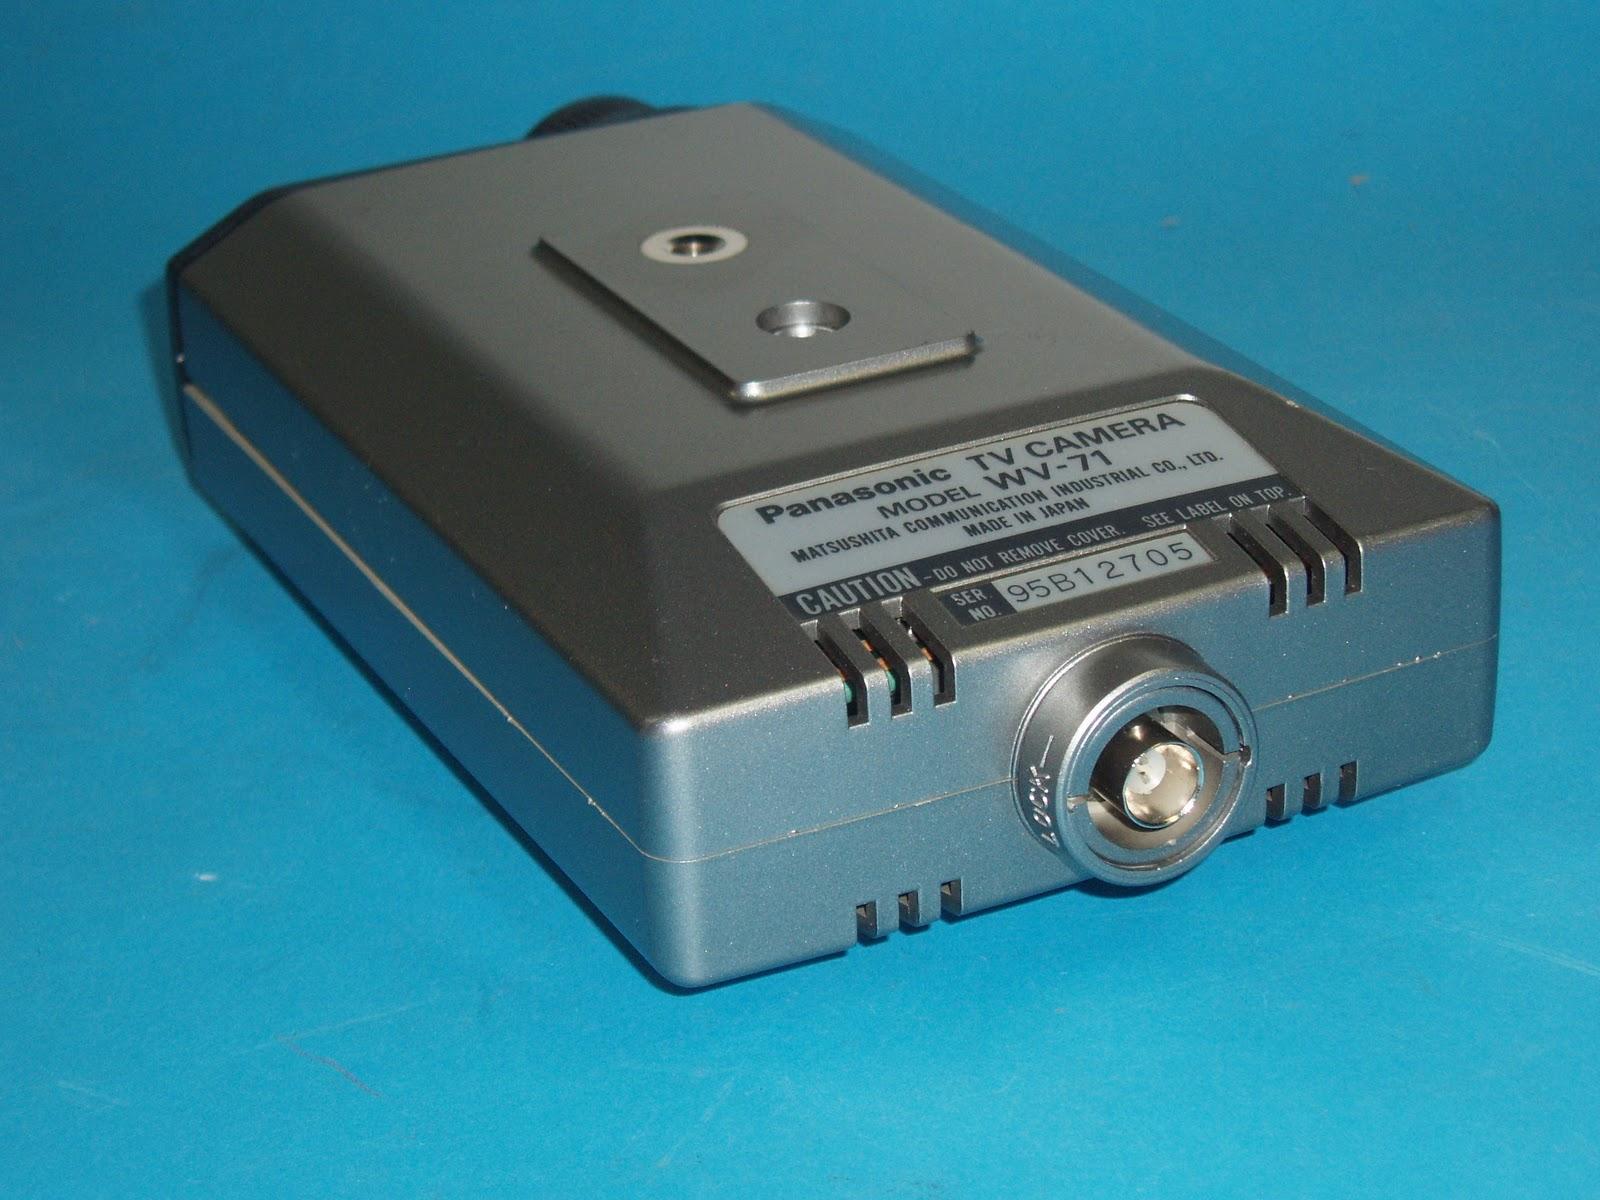 Panasonic TV Camera Model WV-71 - What is inside ~ electronics new